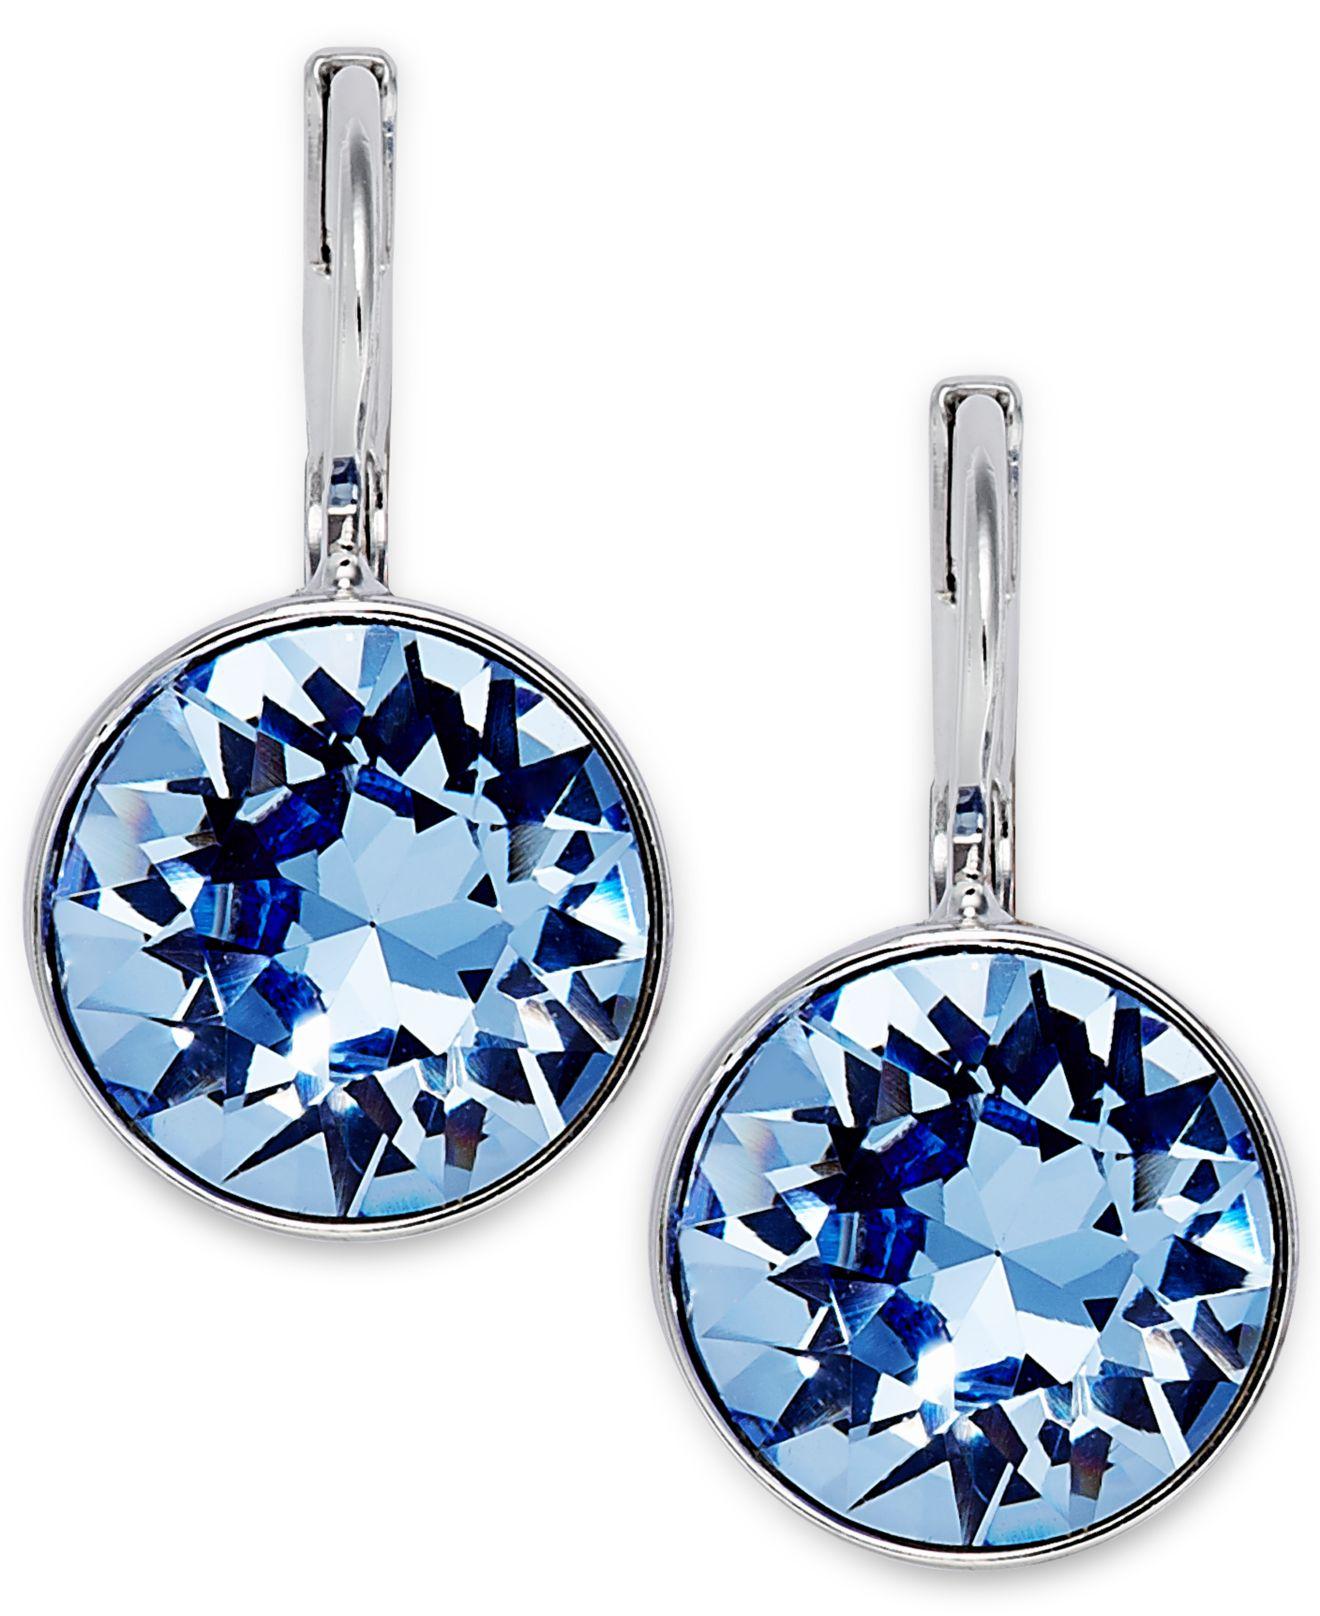 c5f6bfa98 Swarovski Rhodium-Plated Light Sapphire Crystal Drop Earrings in ...